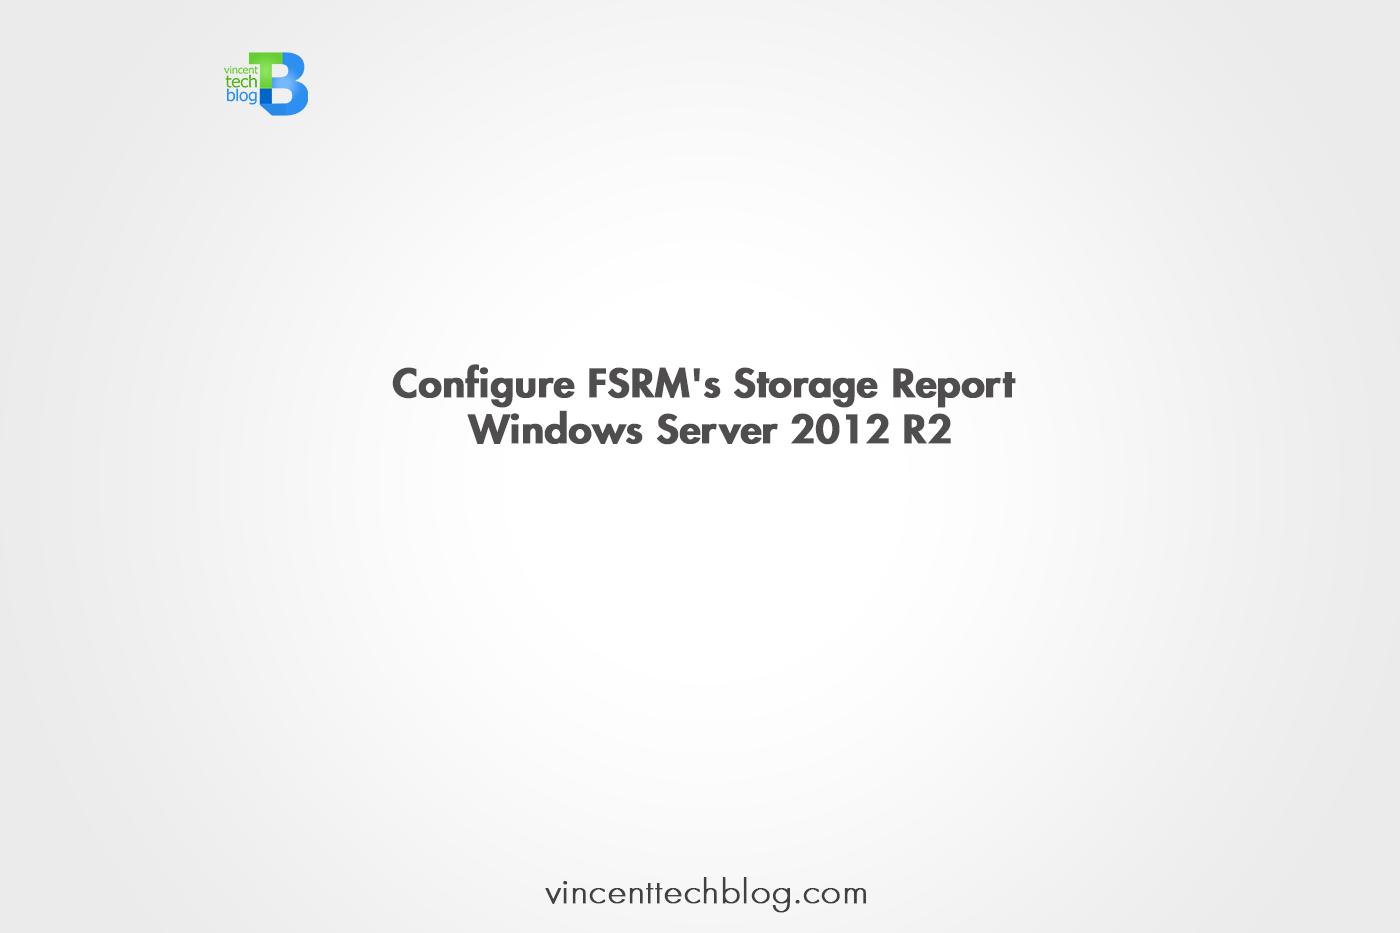 Storage Report